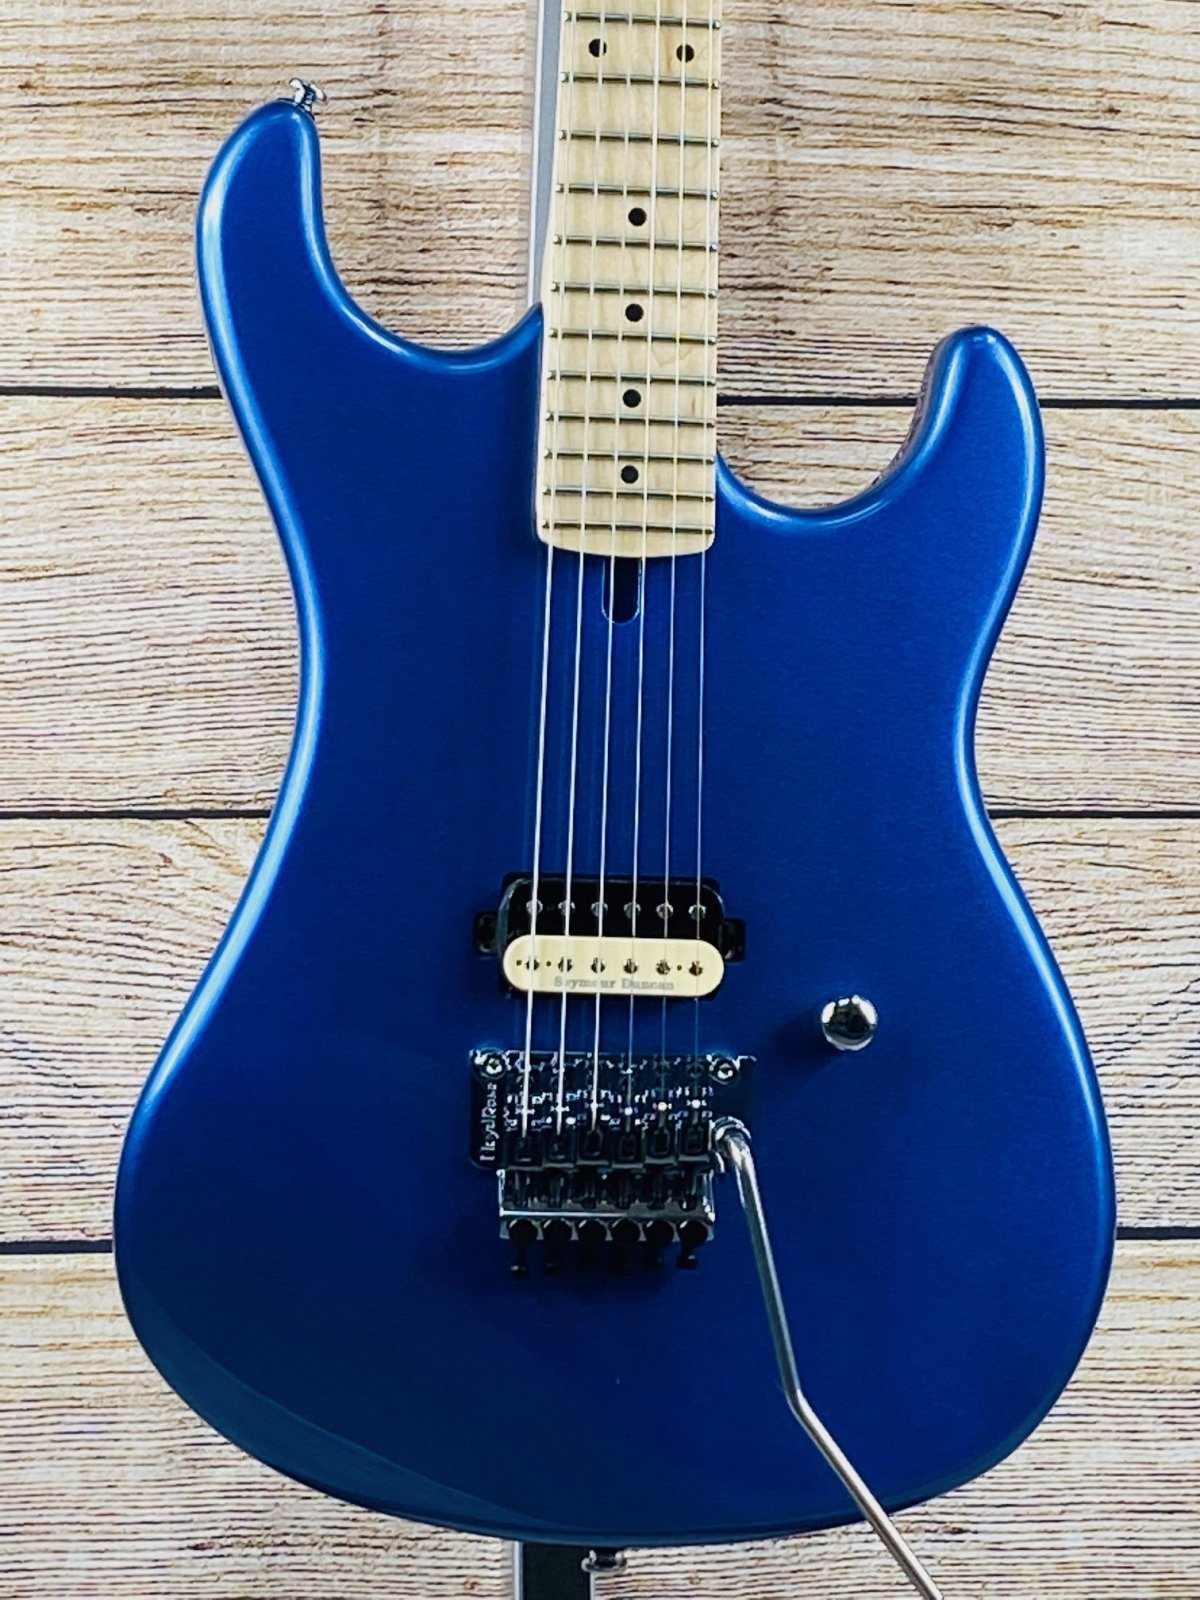 Kramer The 84 Electric Guitar - Blue Metallic